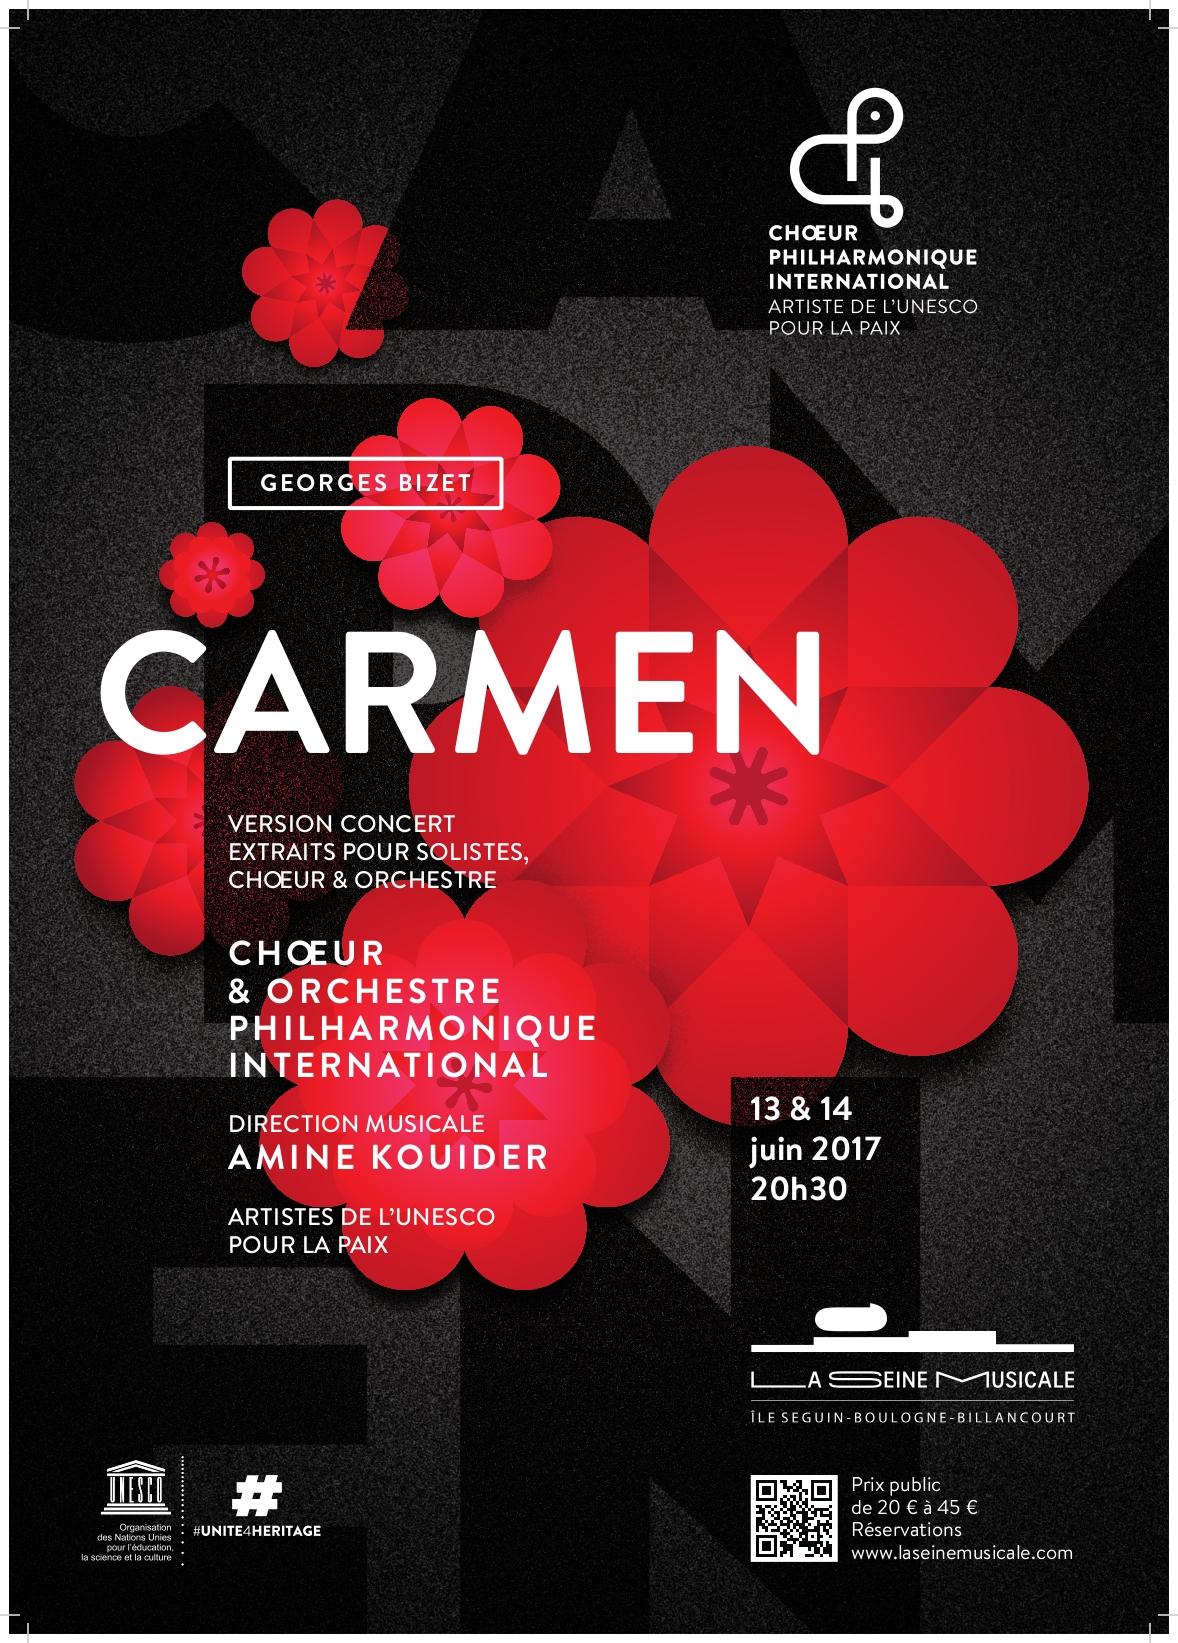 carmen-2017_affiche-a3_hd